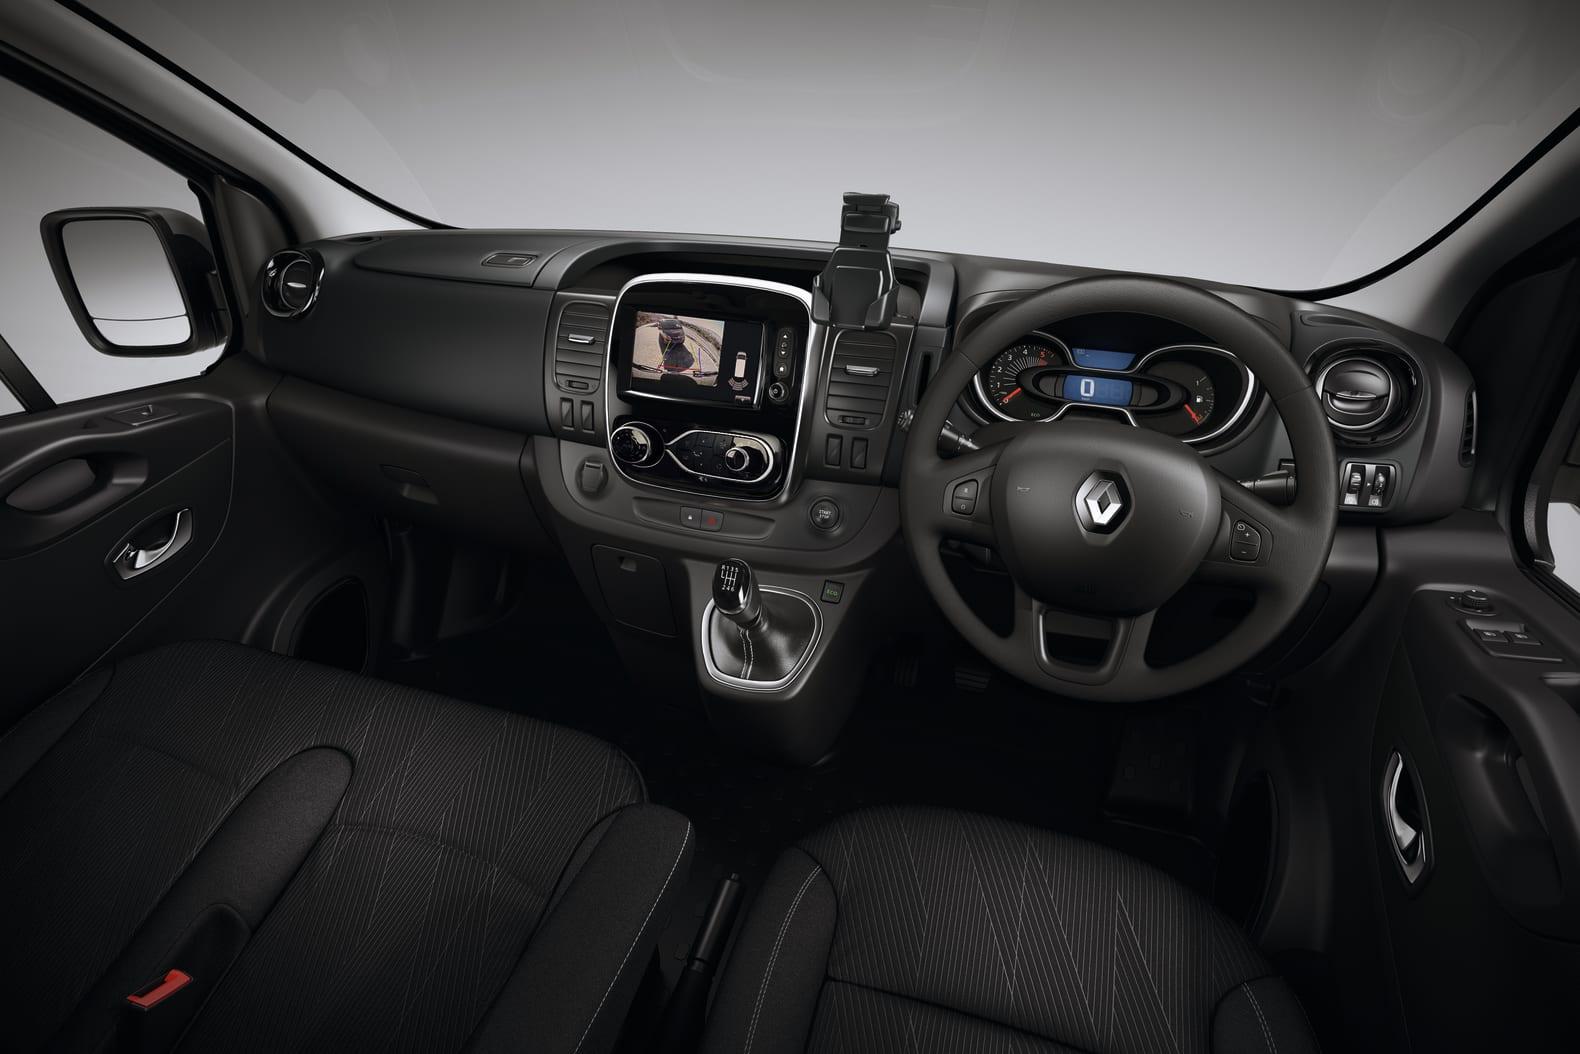 New Renault Trafic Black Edition John Clark Renault